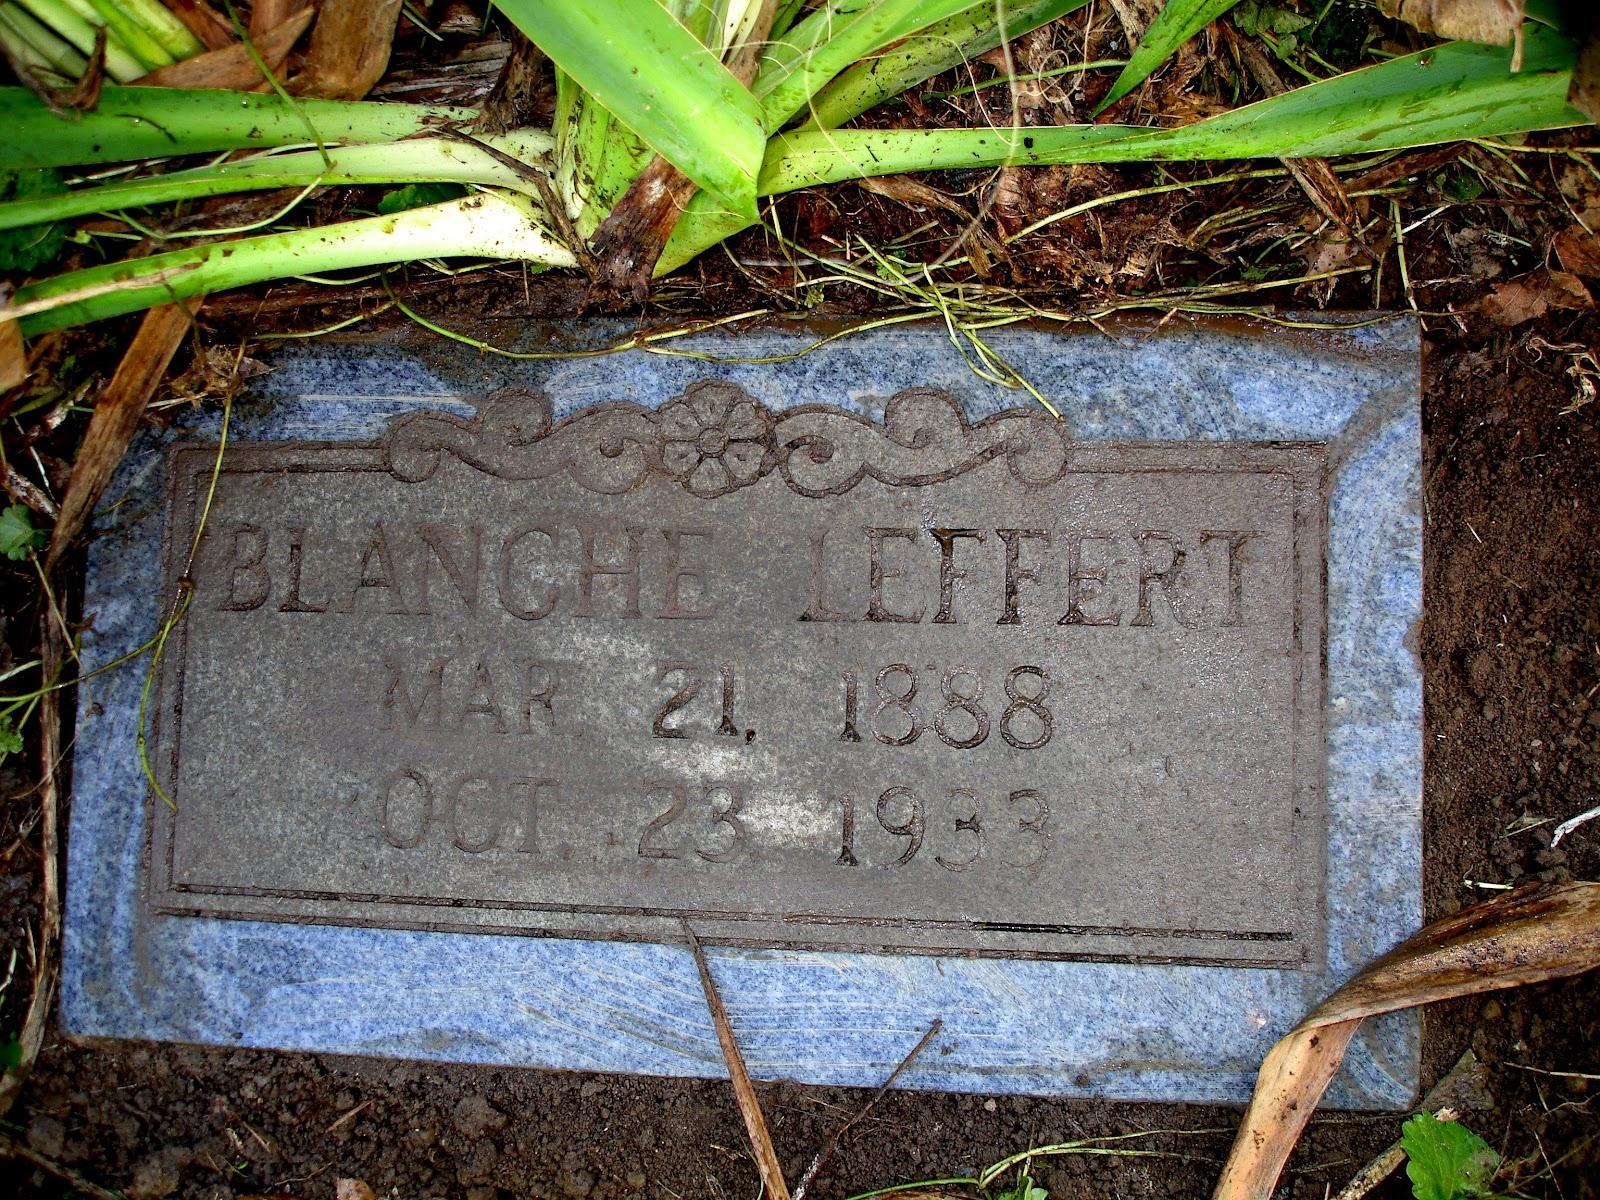 Blanche Leffert b1888.jpg